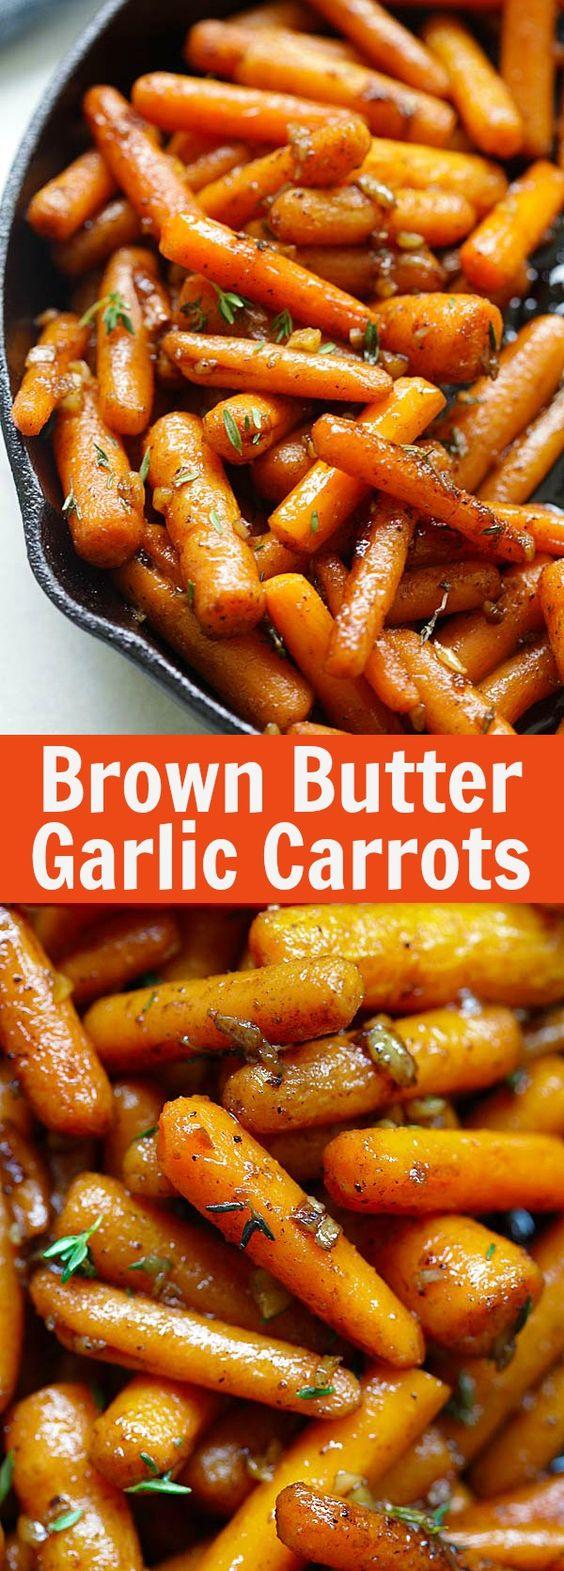 Brown Butter Garlic Honey Roasted Carrots.